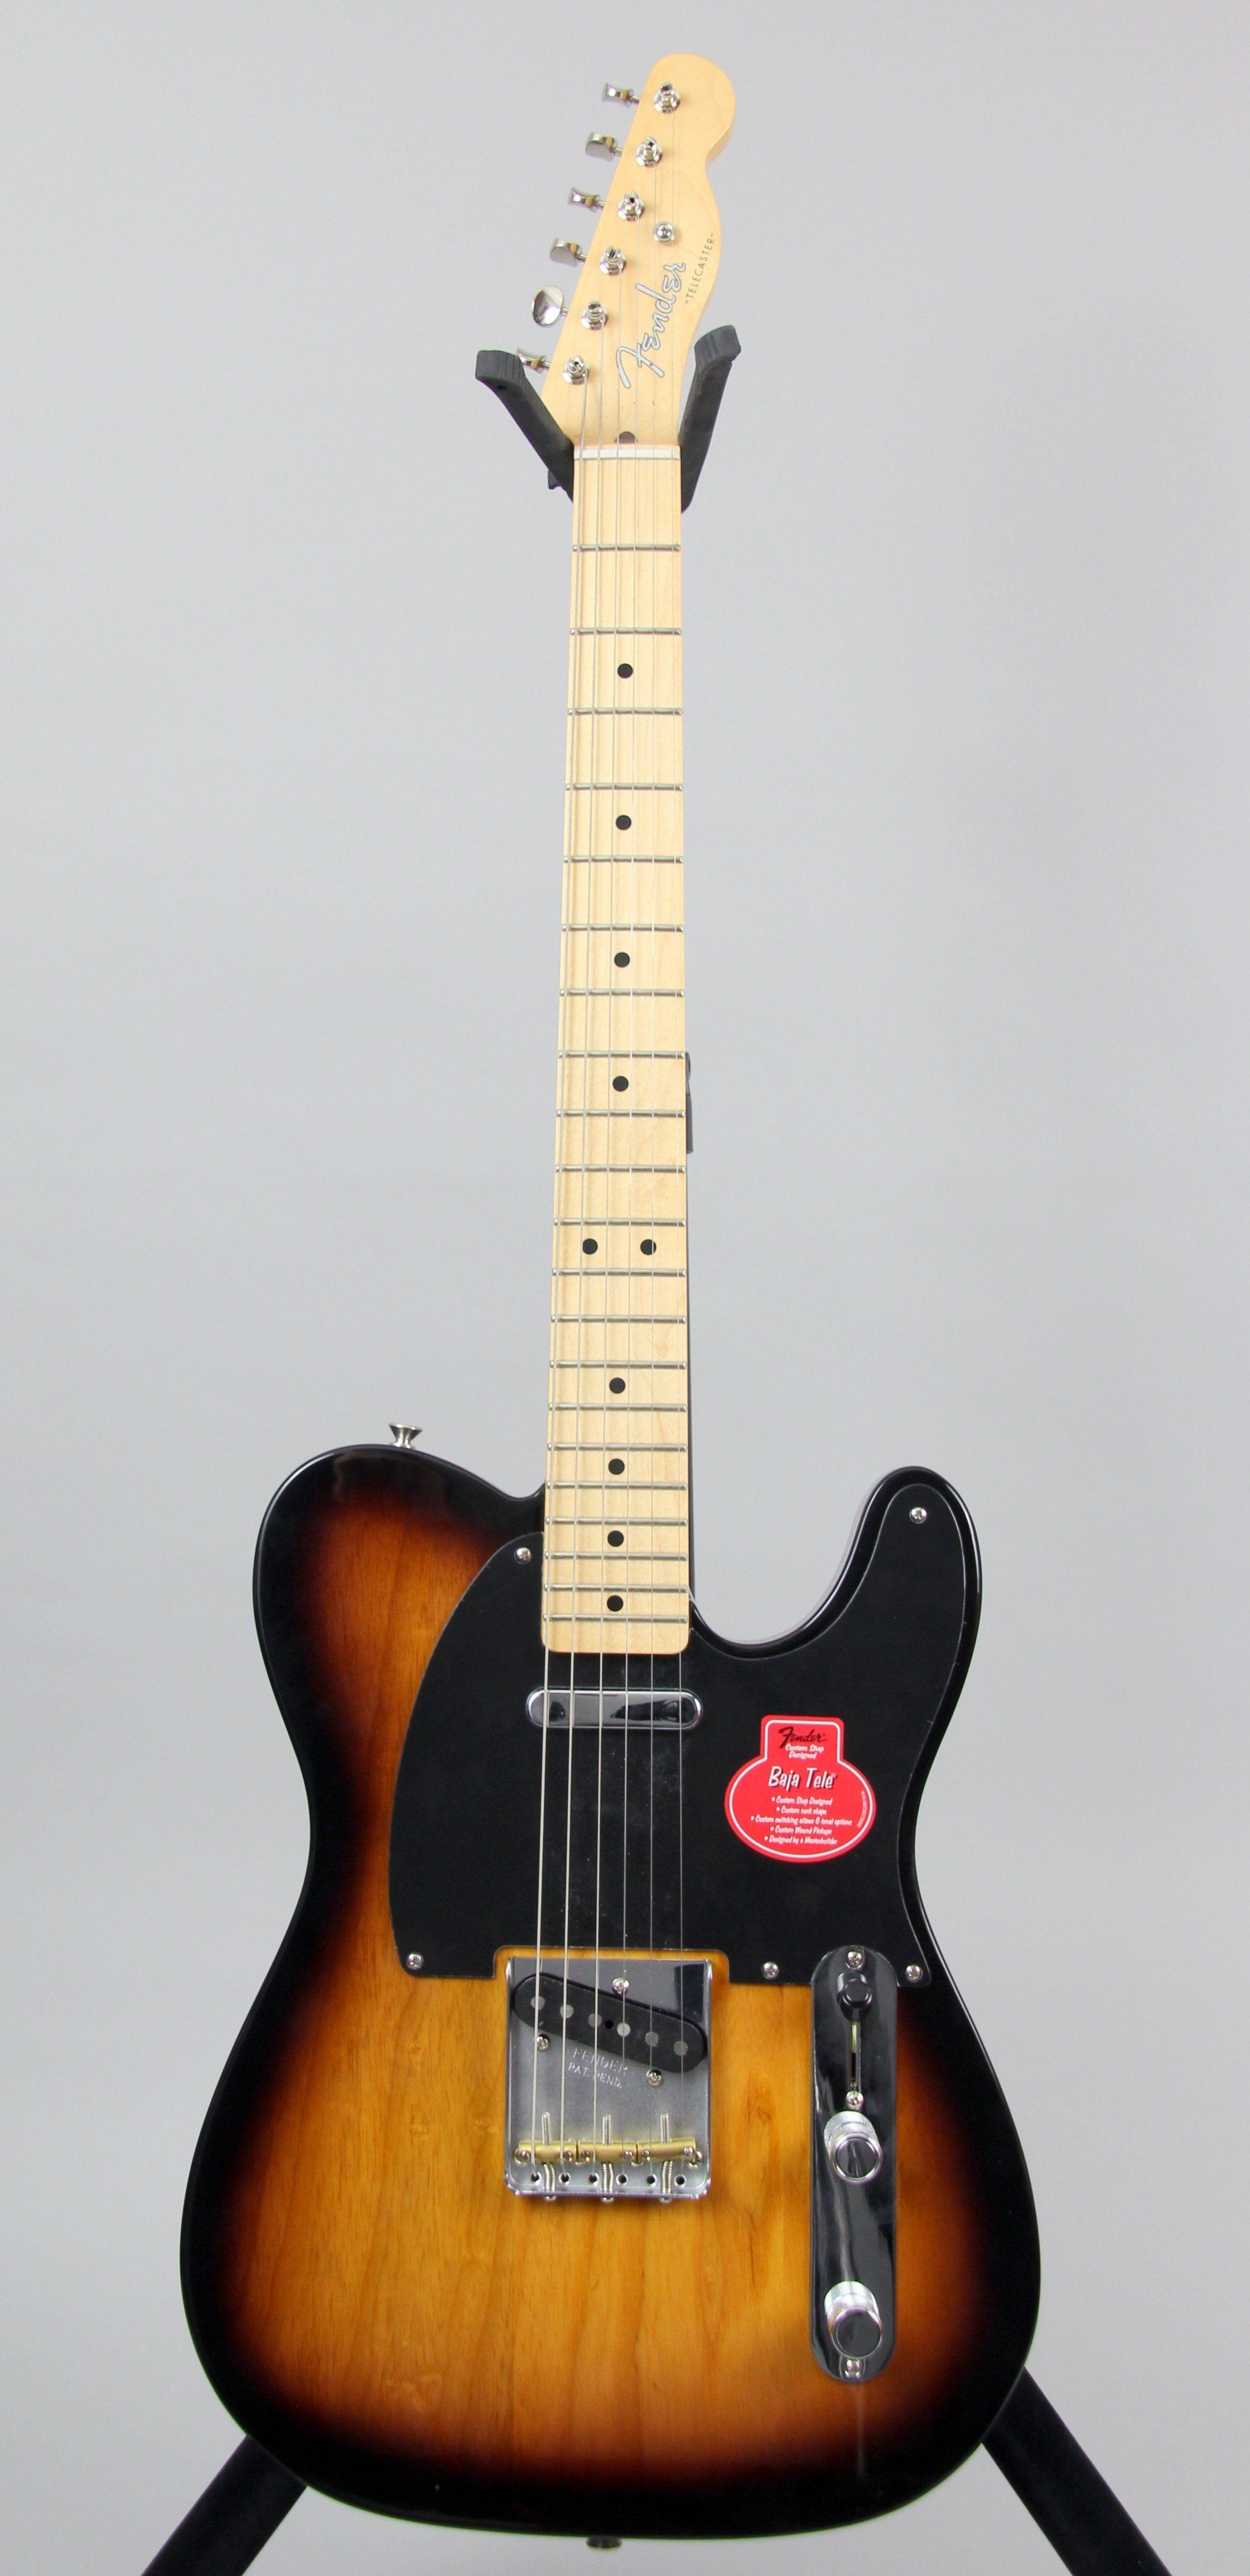 Fender Classic Player Baja Telecaster - 2 Color Sunburst | Guitars ...